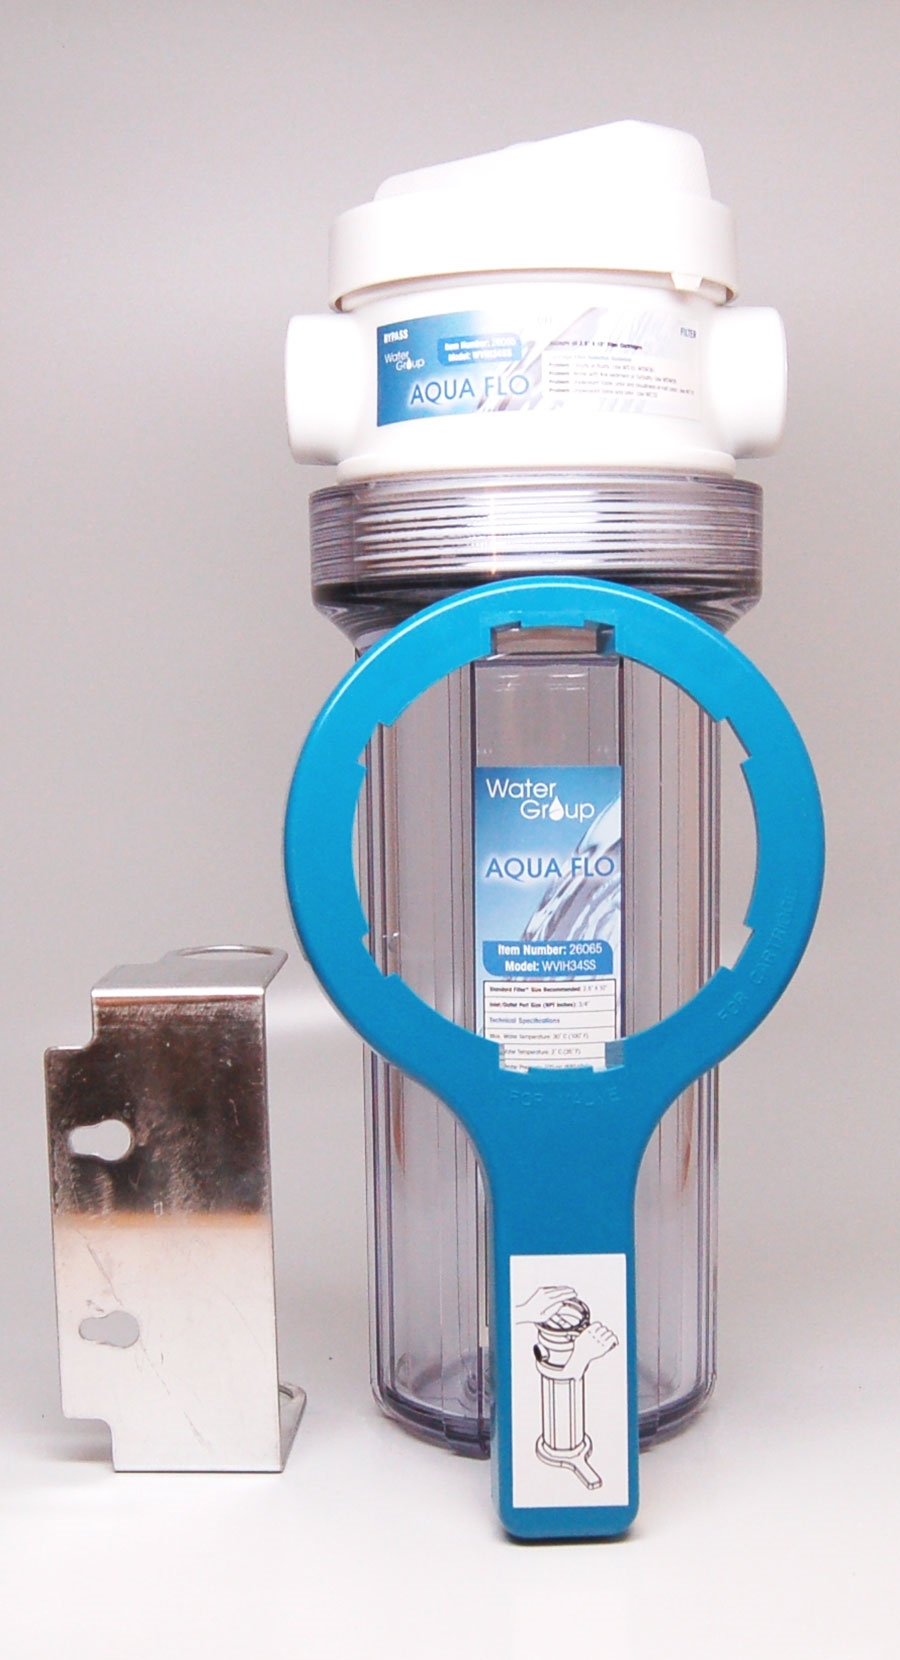 Hydrotech Water Filter 26000 WCT34 Aqua Flo Water Filter